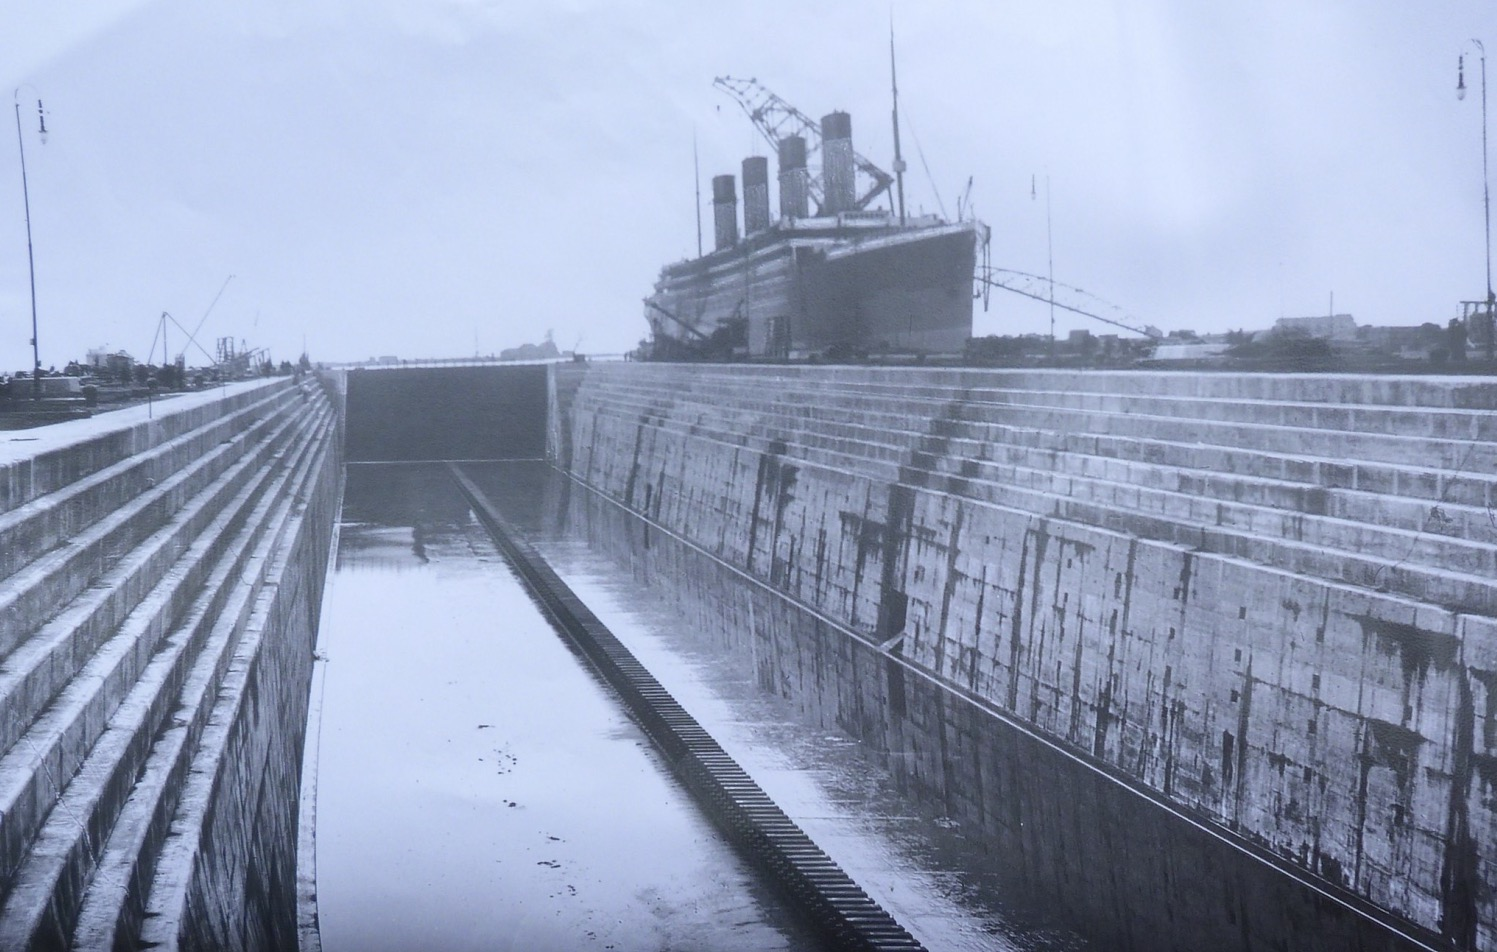 SS Nomadic - Le petit frère du Titanic - 1/200 - 3D [Conception] 50604430121_22a2e94ae2_o